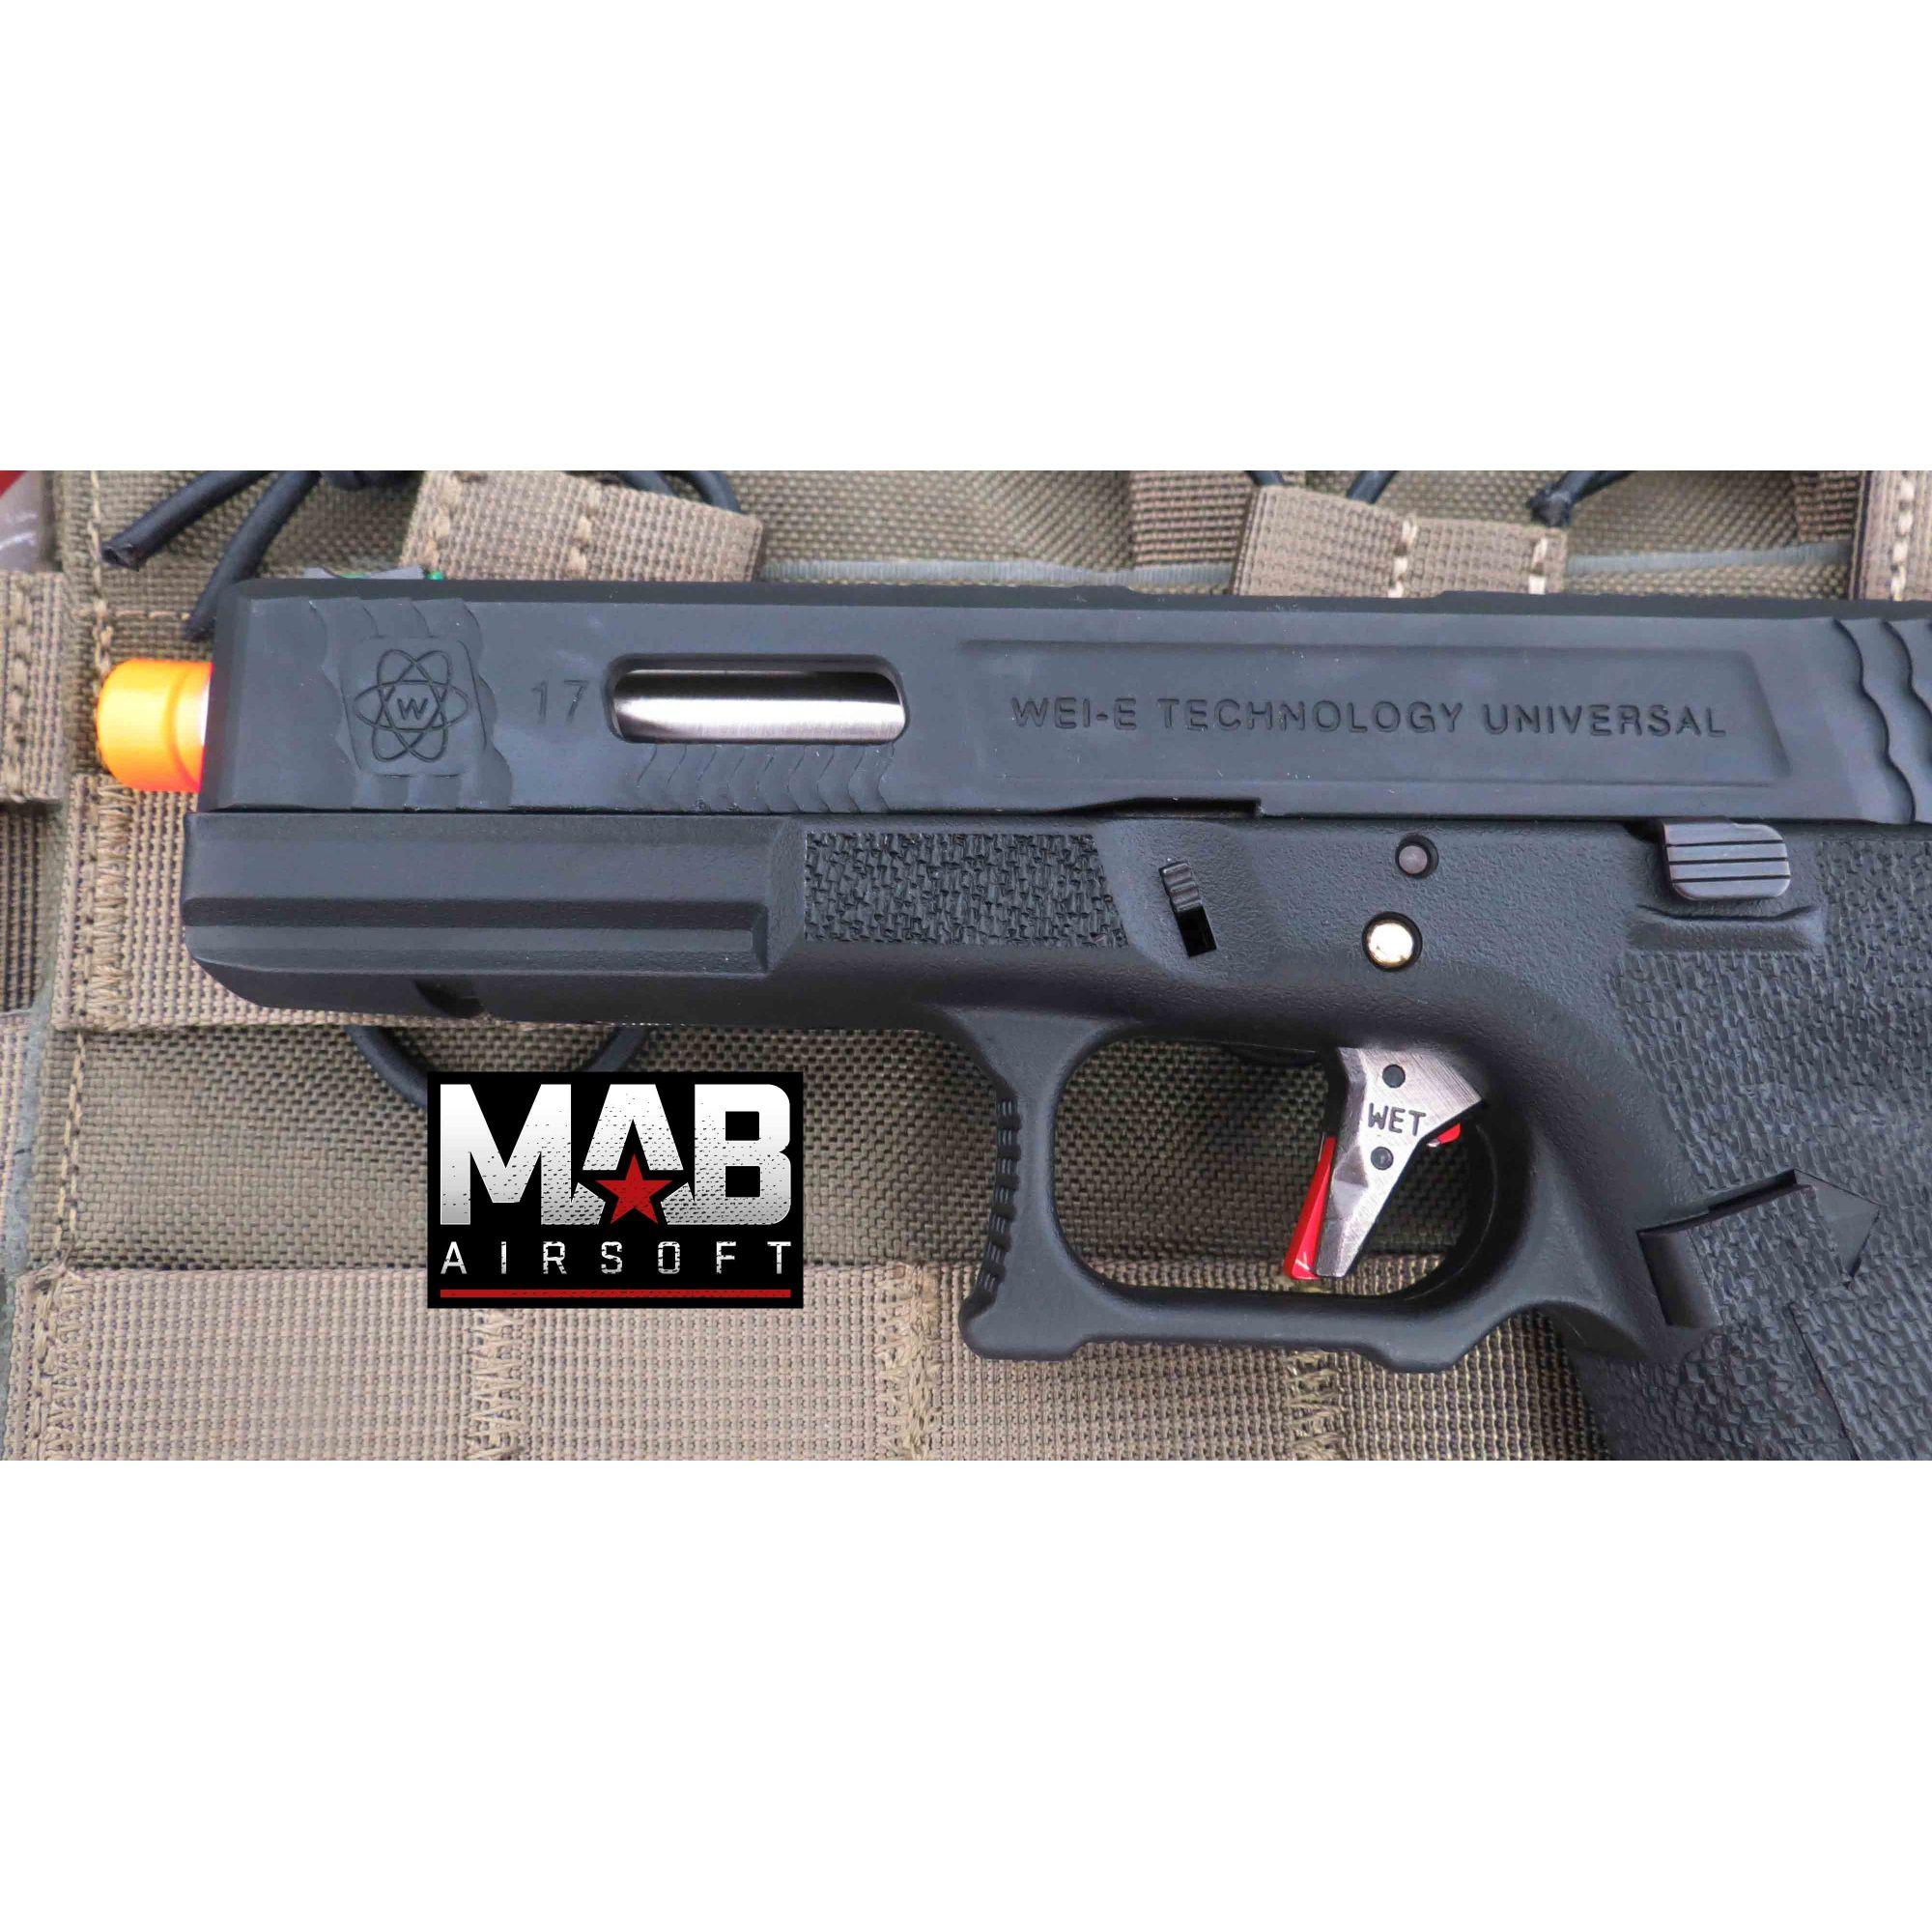 Pistola Airsoft WE Glock G17 T5 GBB Metal e Polimero Preta - Calibre 6 mm  - MAB AIRSOFT